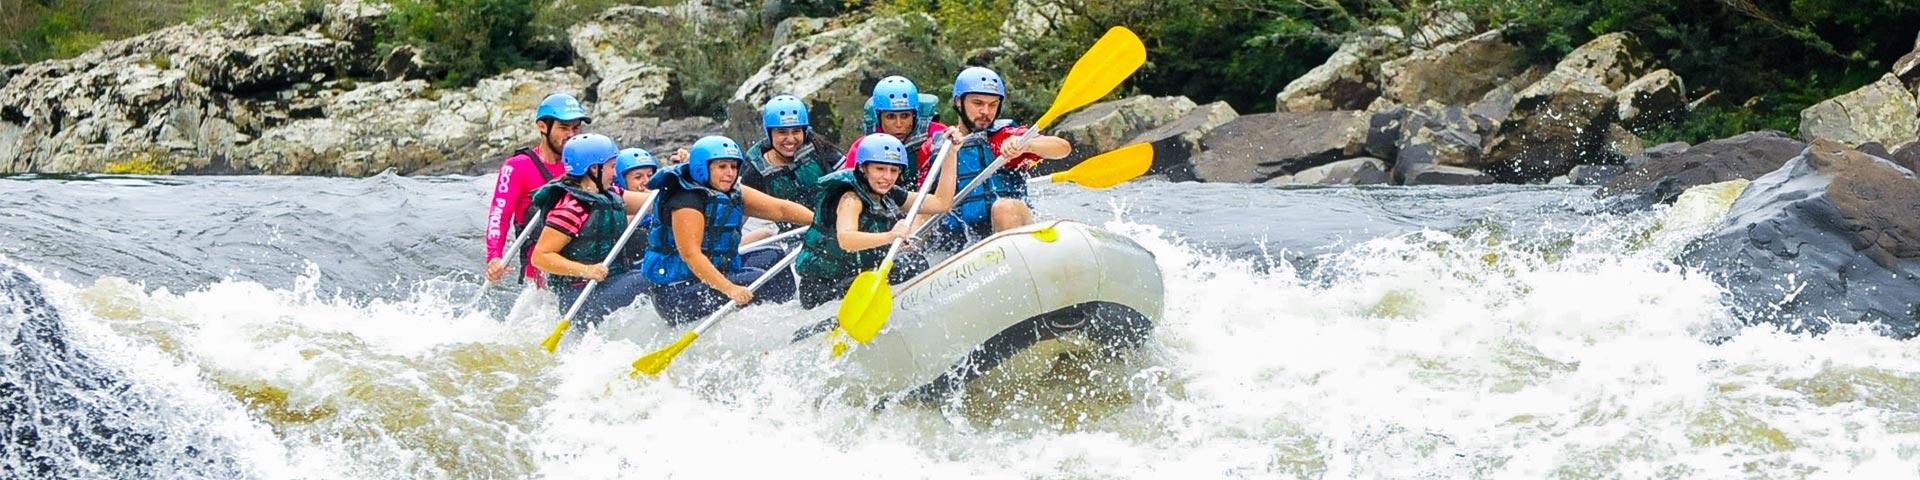 Cia-Aventura-rafting-rio-das-antas-Bonitour-Passeios-em-Serra-Gaucha-2819122555.jpg